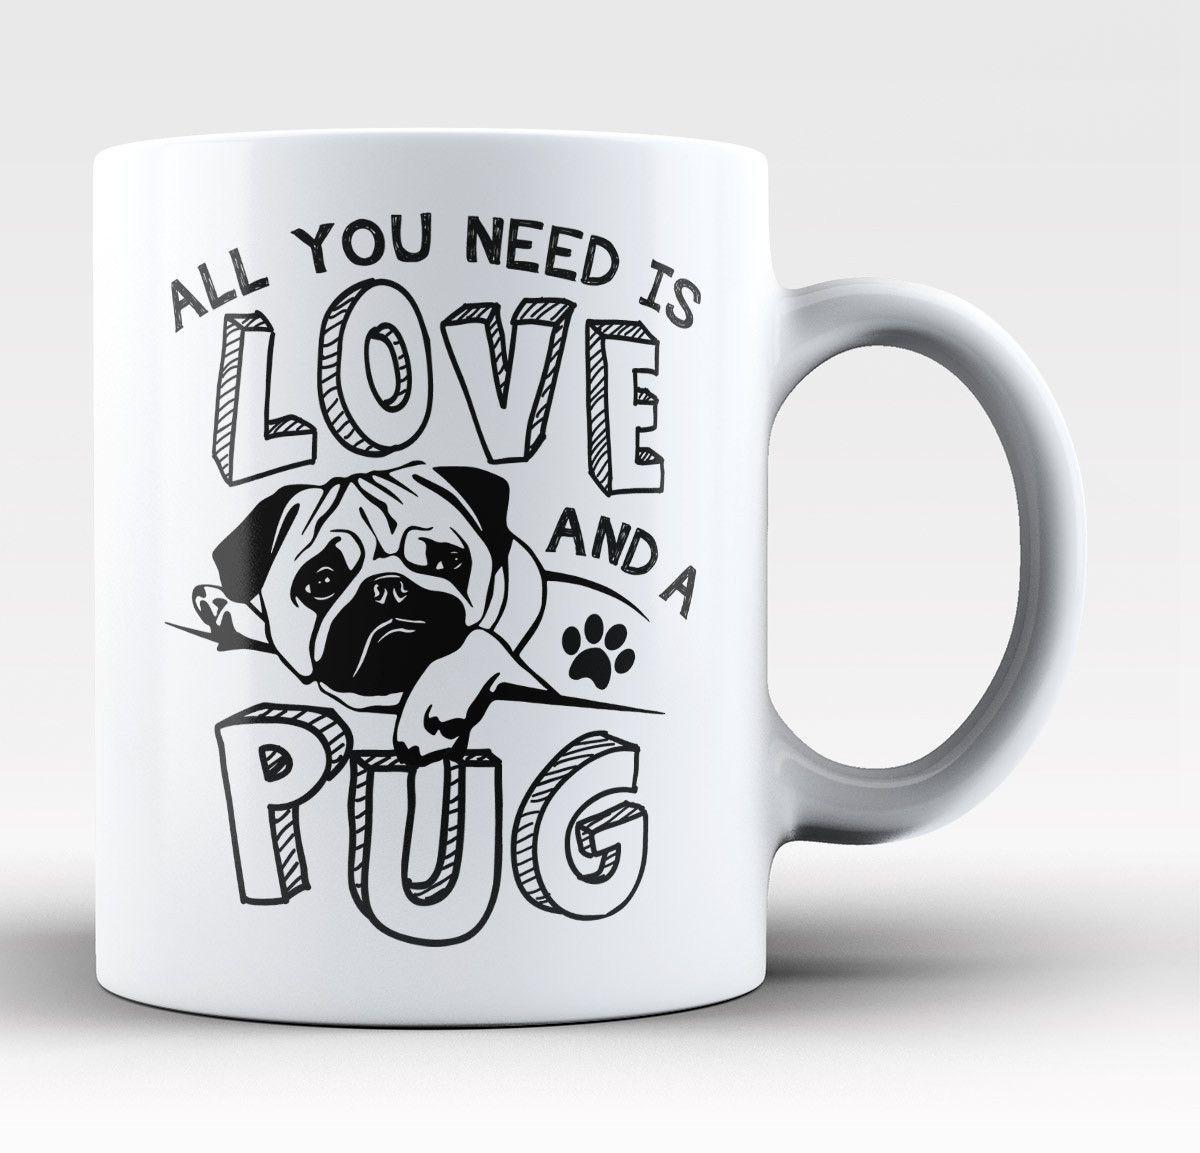 All You Need Is Love and a Pug - Mug